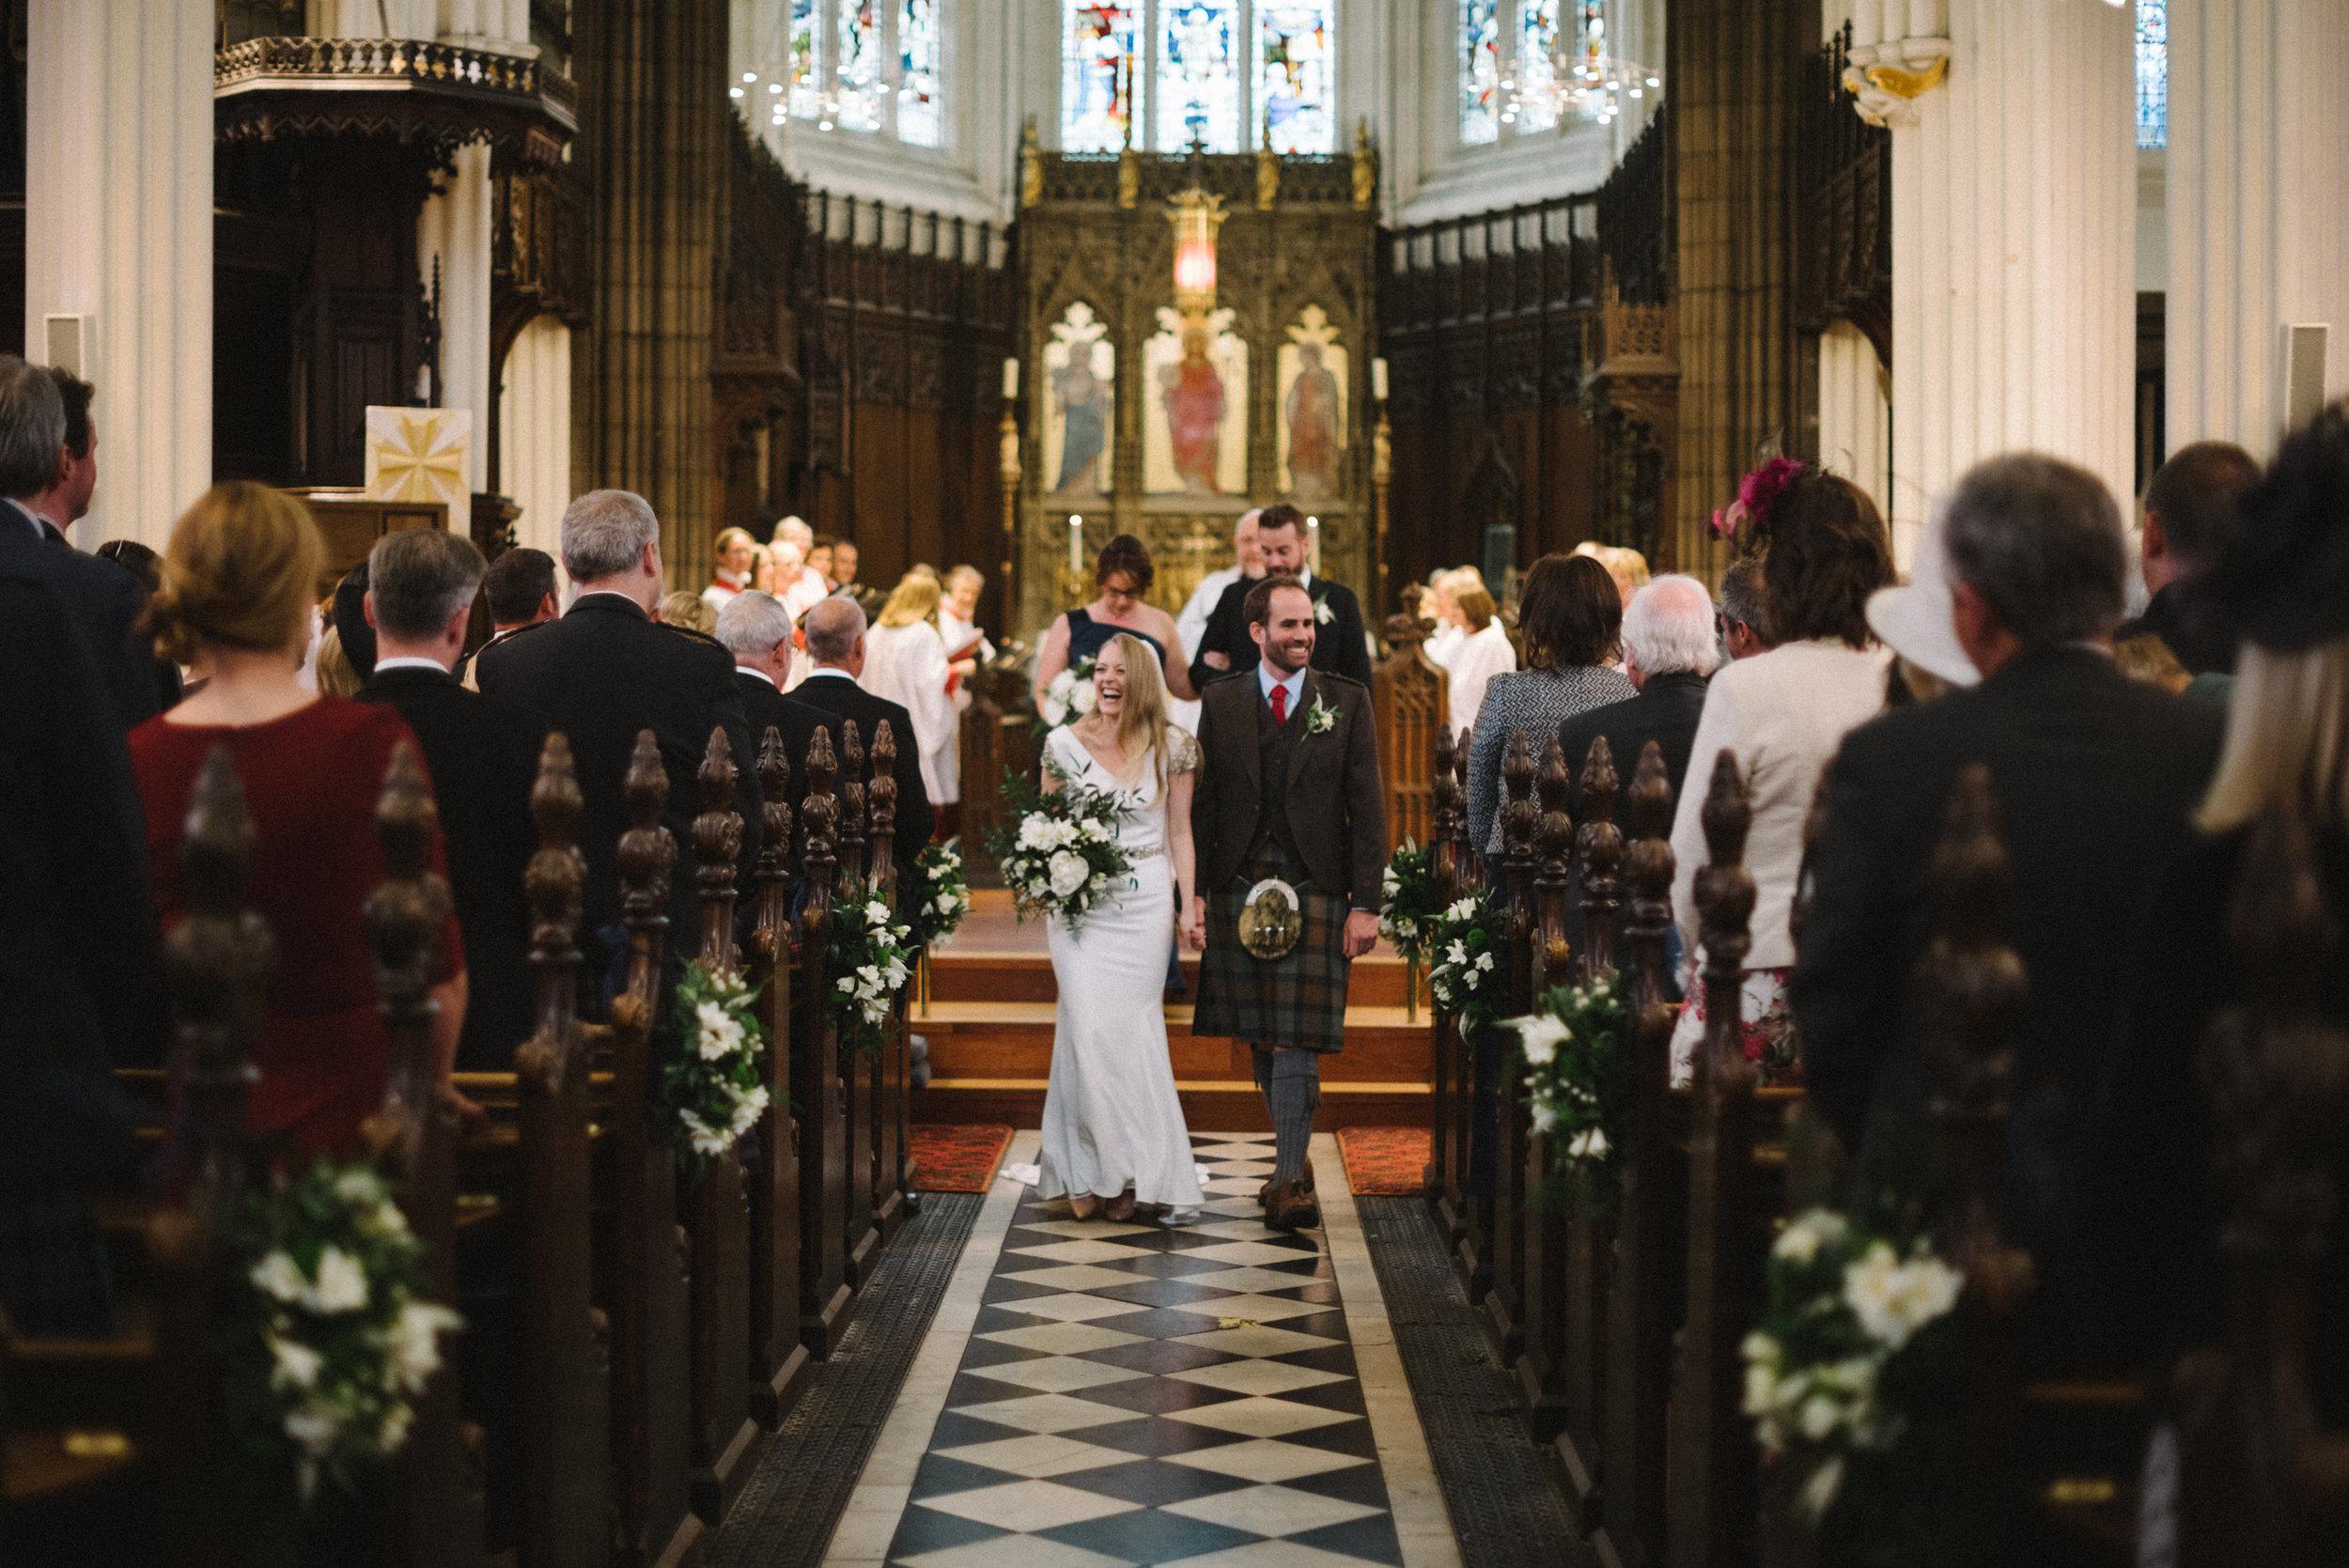 0176-LISA-DEVINE-PHOTOGRAPHY-ALTERNATIVE-WEDDING-PHOTOGRAPHY-SCOTLAND-DESTINATION-WEDDINGS-GLASGOW-WEDDINGS-COOL-WEDDINGS-STYLISH-WEDDINGS.JPG